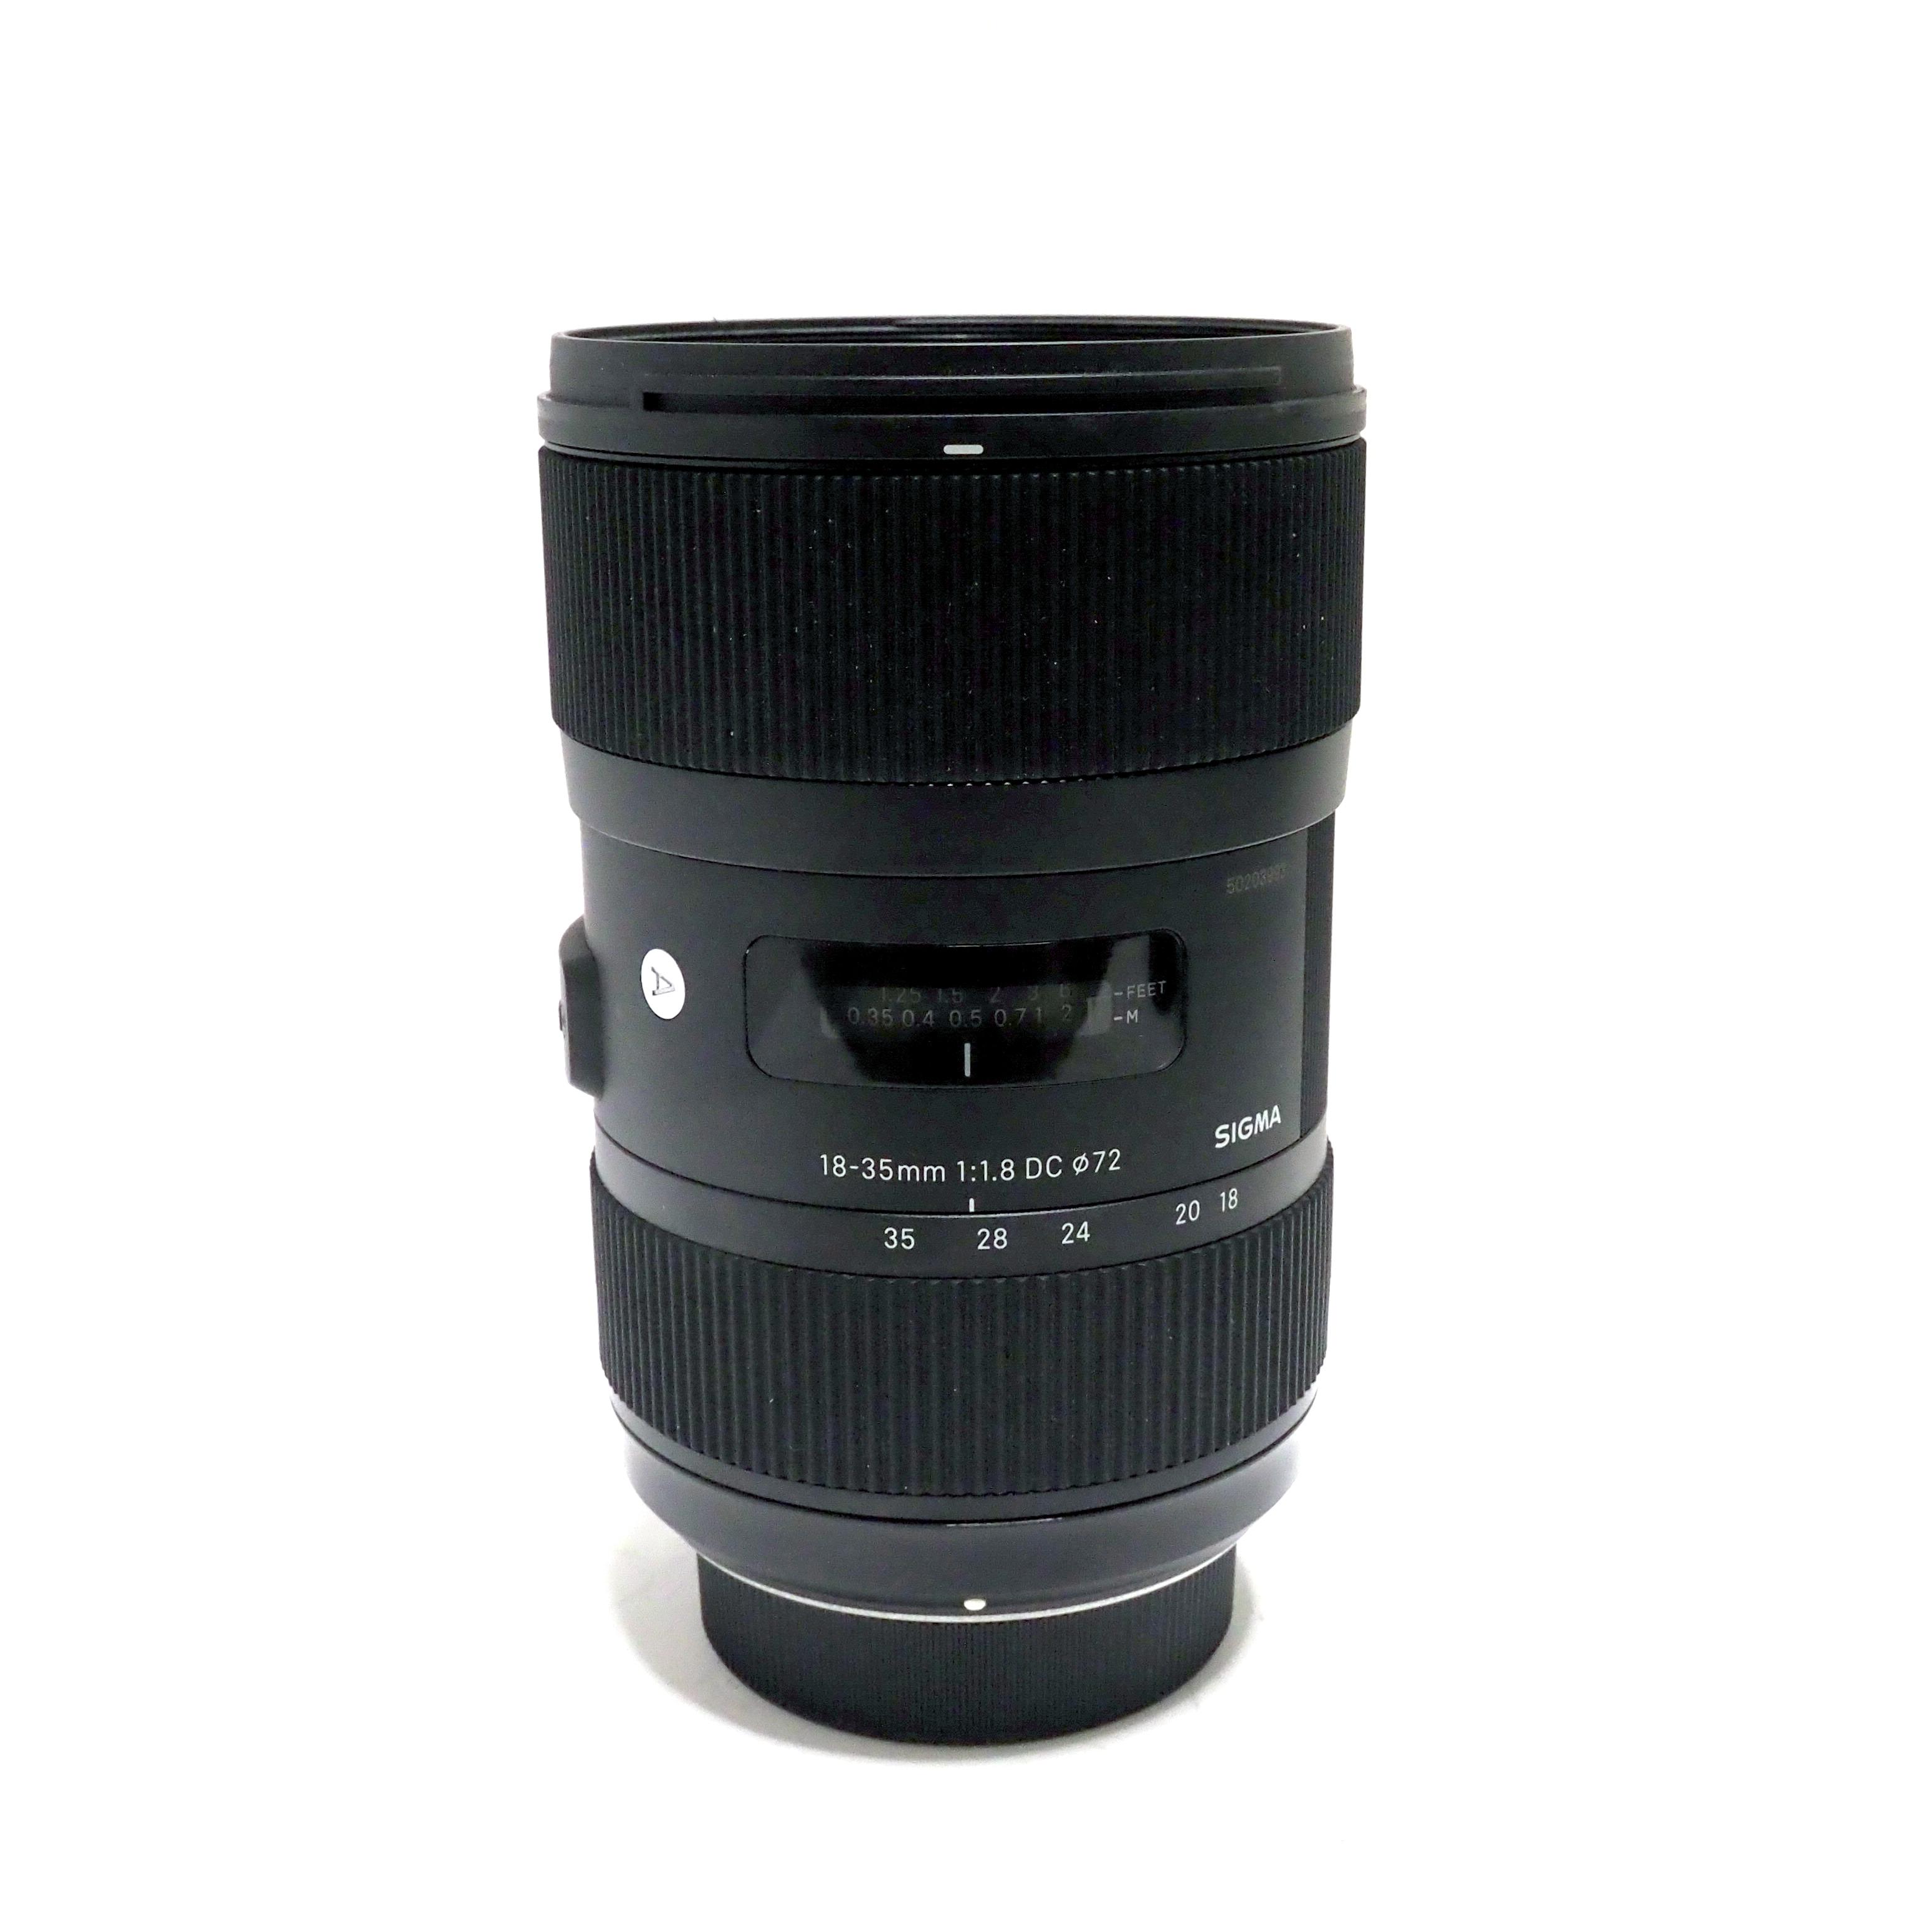 SIGMA AF 18-35mm f/1,8 DC HSM Art för Nikon - BEGAGNAT